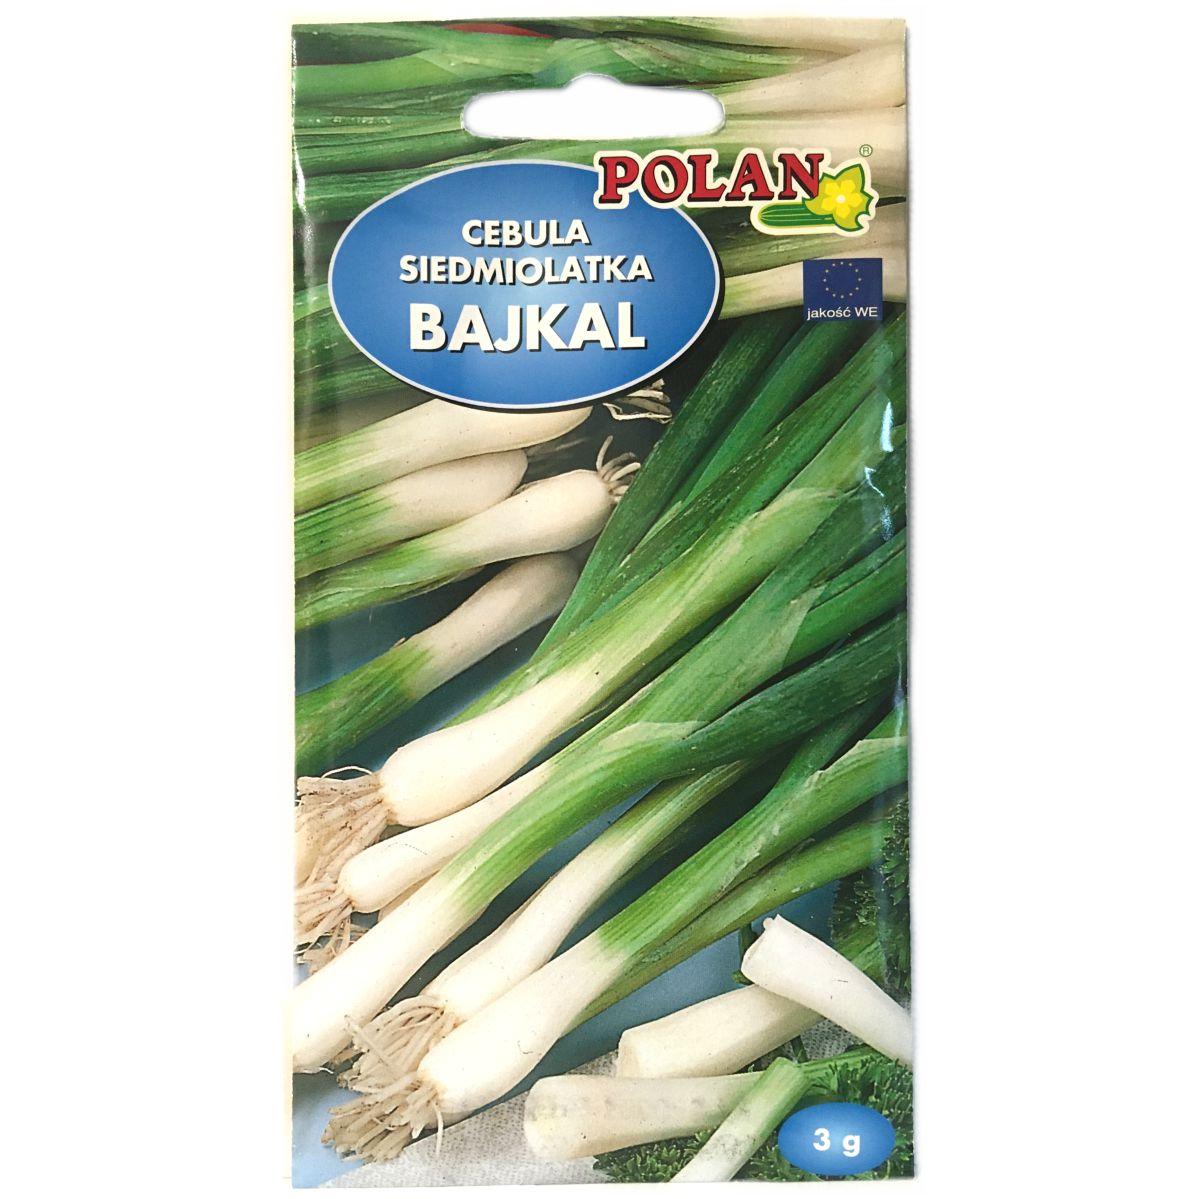 Cebula siedmiolatka Bajkal nasiona Polan